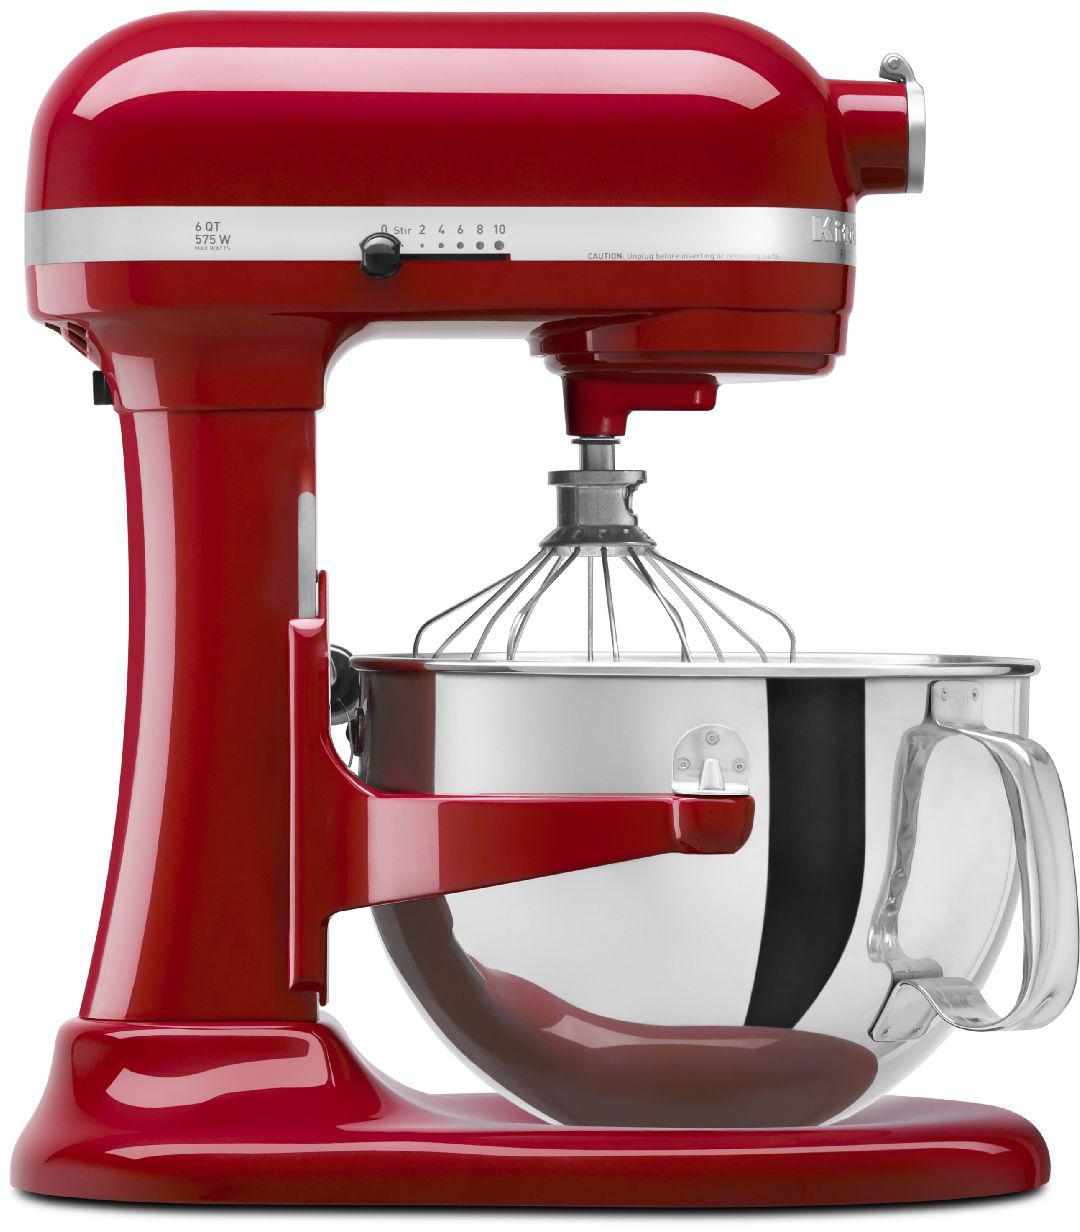 KitchenAid Professional 600 Series Empire Red Bowl Lift Stand Mixer, 6 Quart